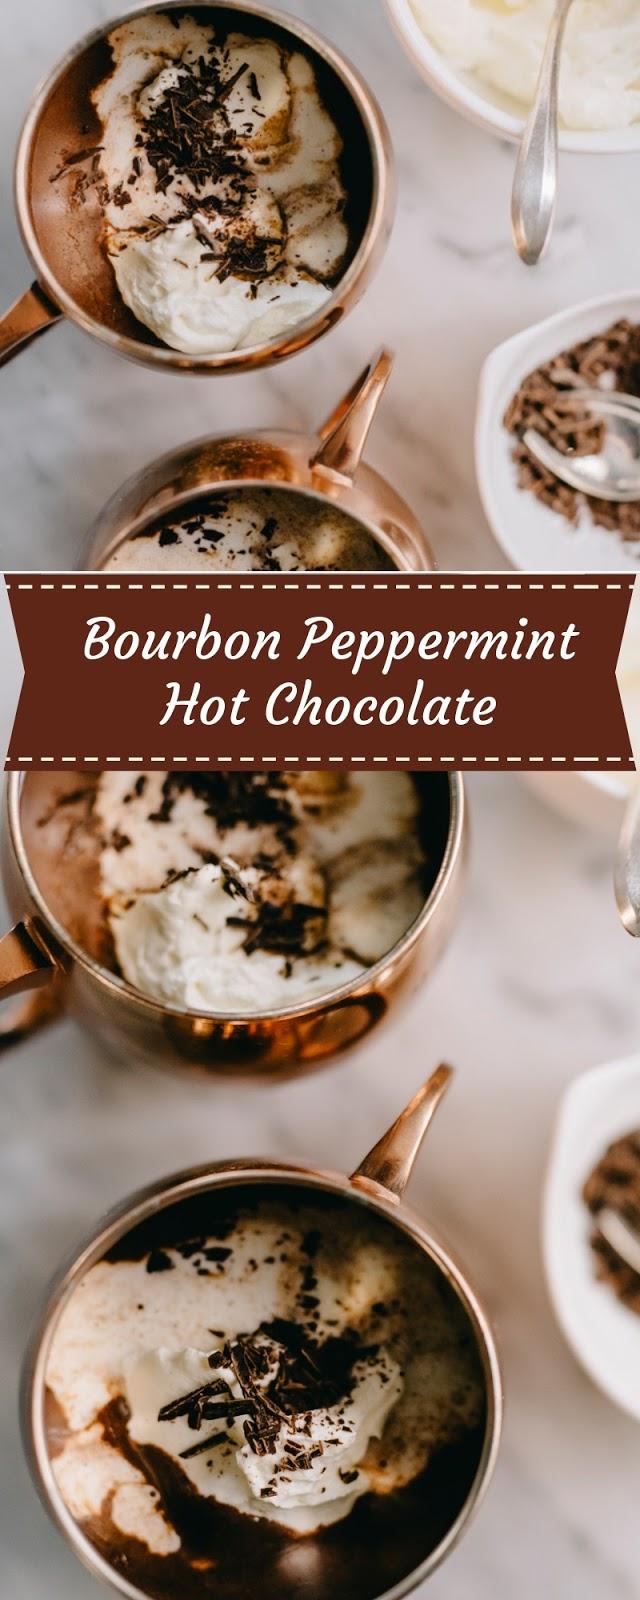 Bourbon Peppermint Hot Chocolate